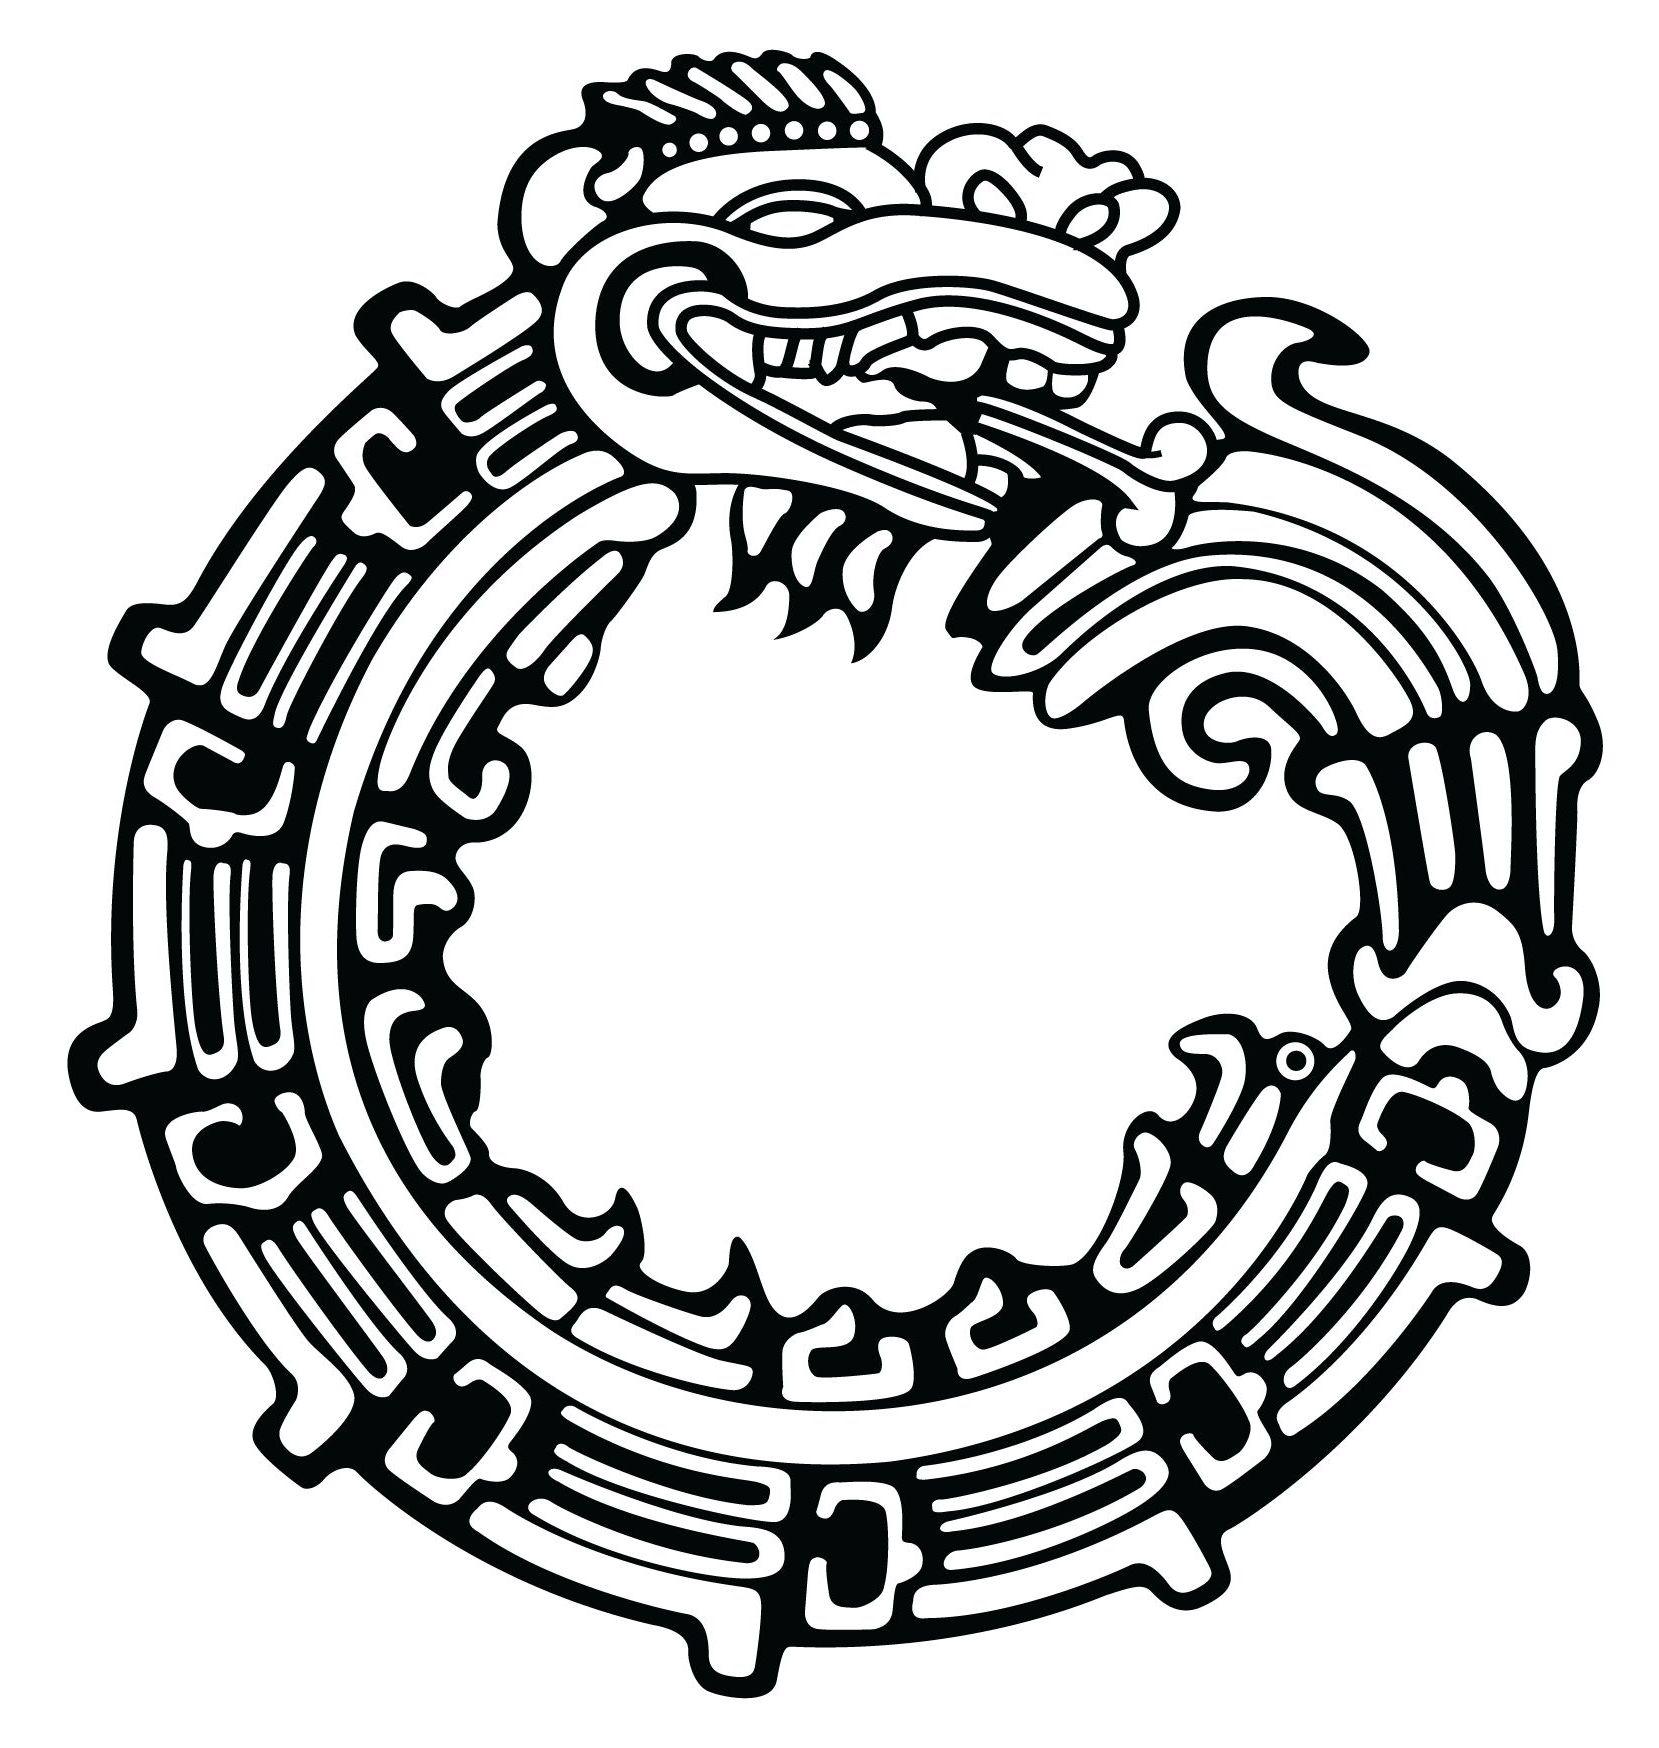 Aztec sun god tattoo design aztec ouroboros tattoo design biocorpaavc Image collections